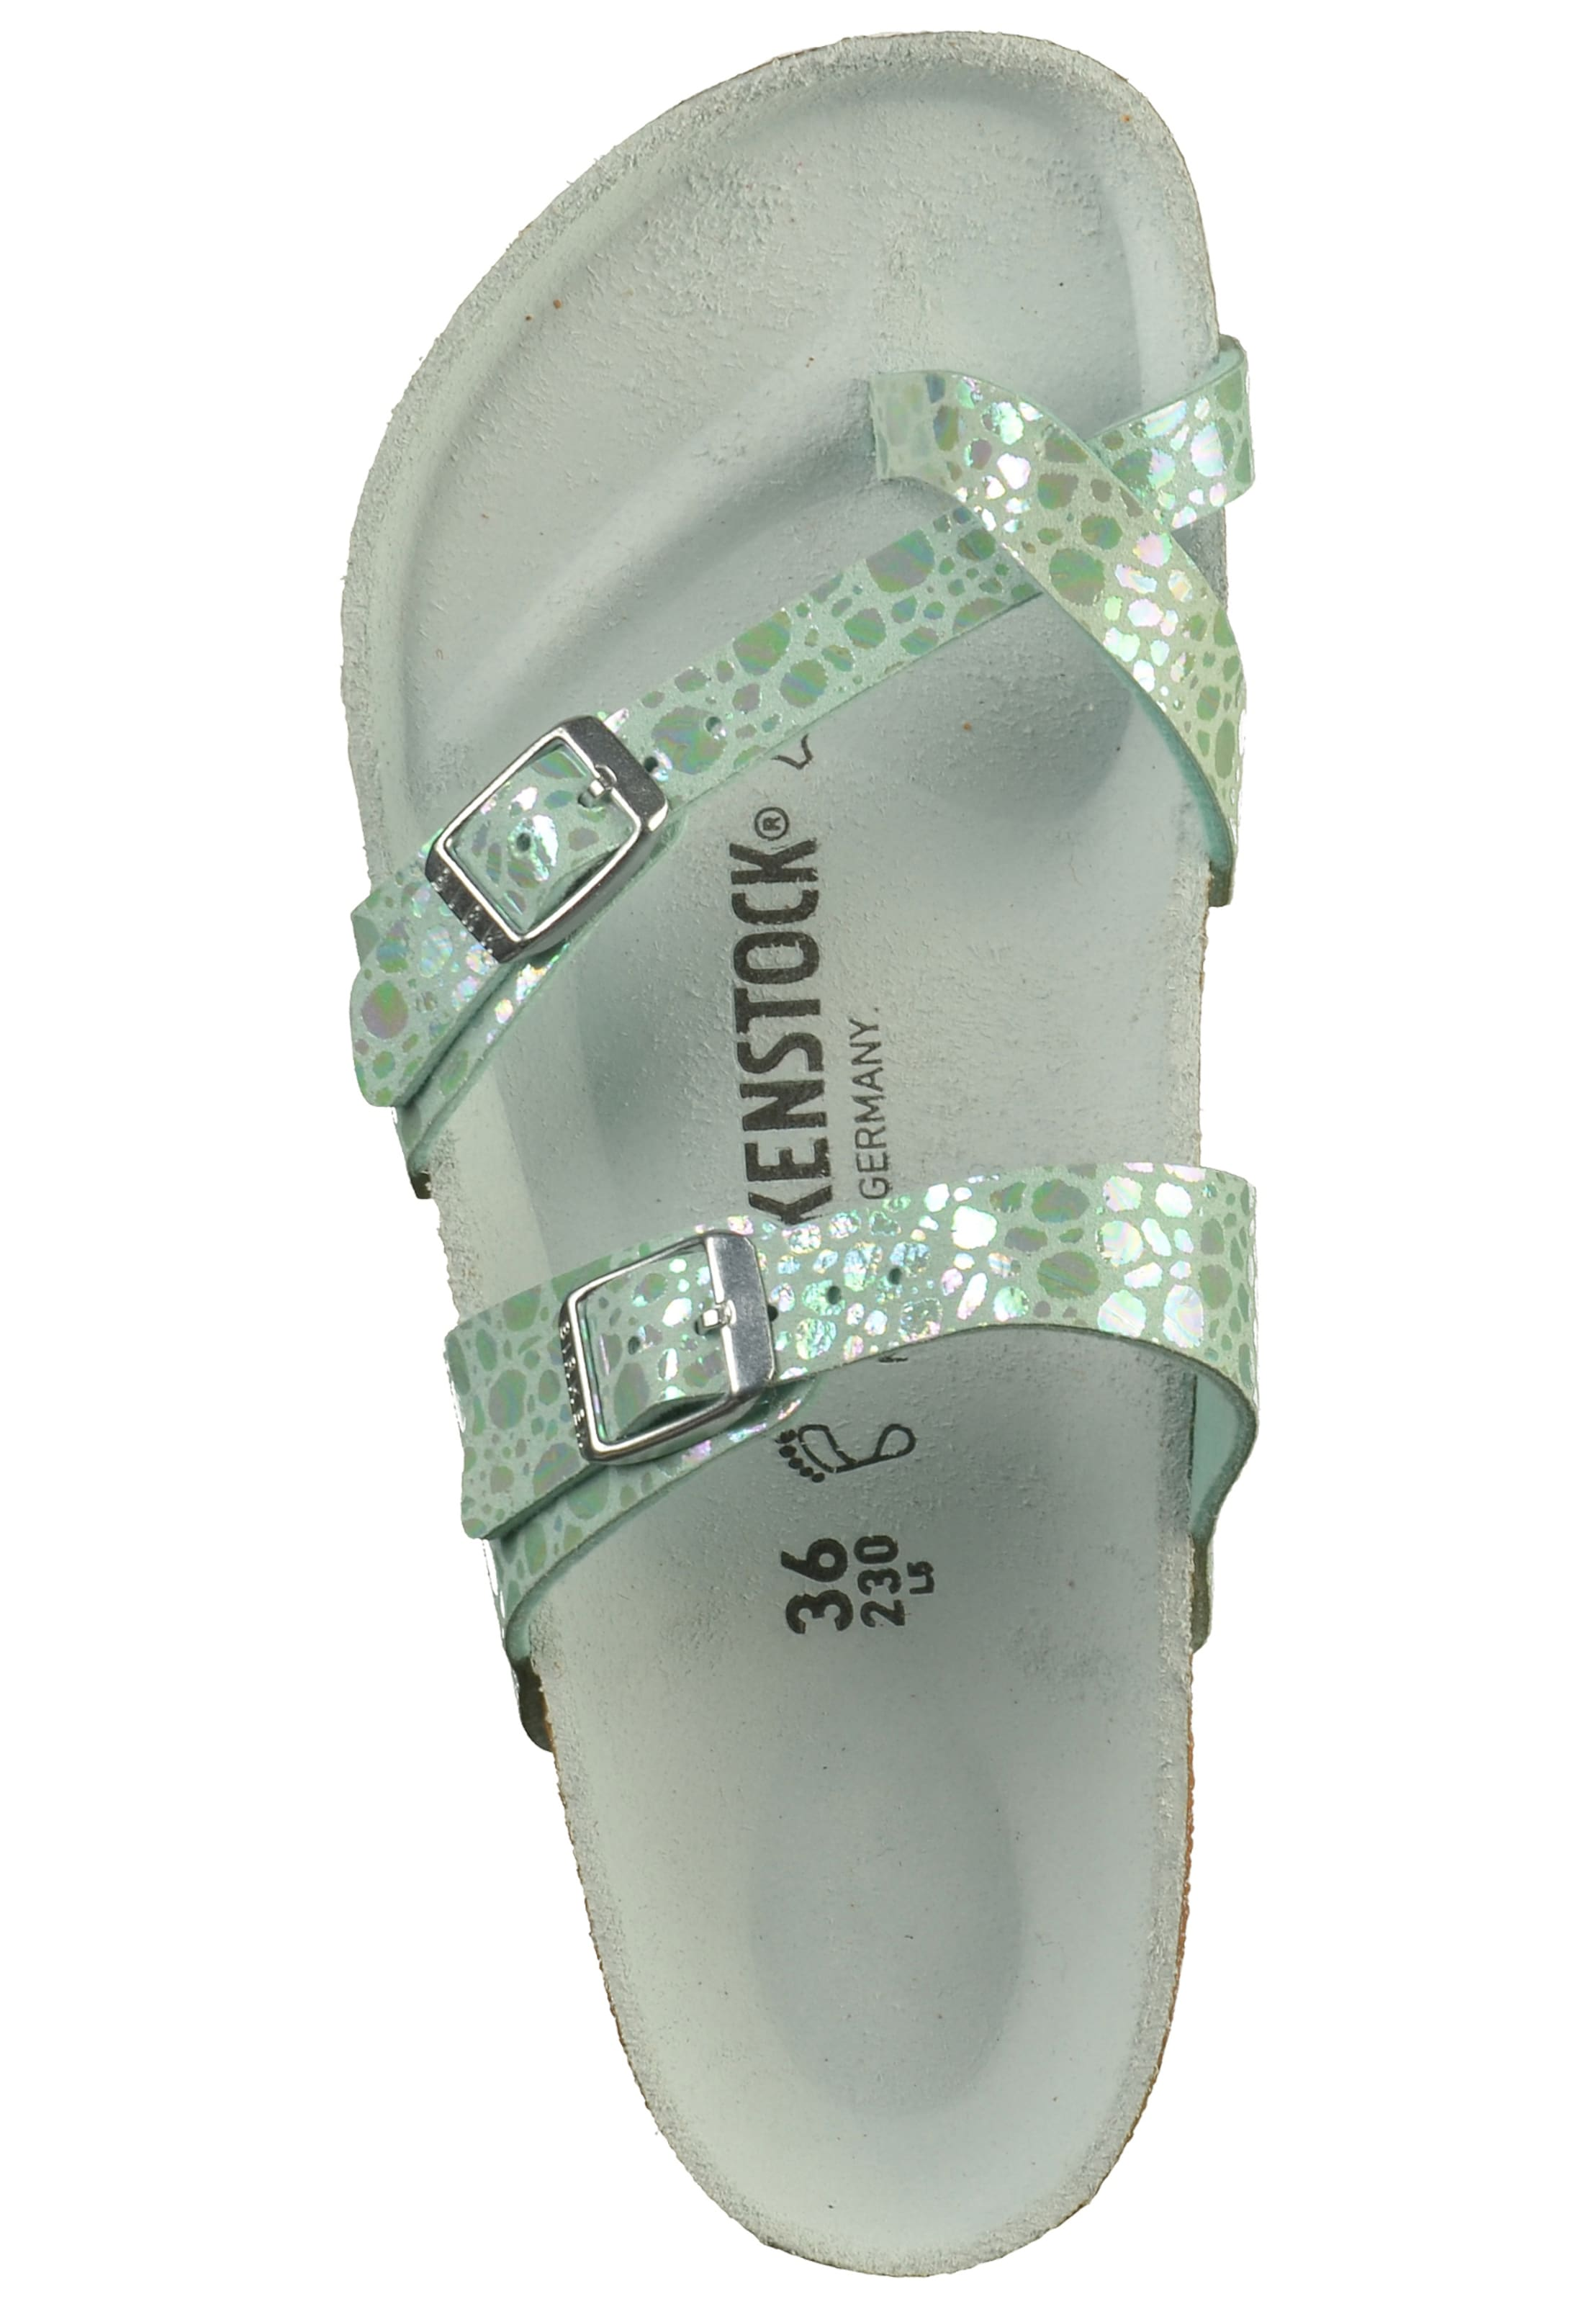 Birkenstock 'mayari' Mint Zehensteg In Mint Birkenstock 'mayari' Zehensteg In 9HWDE2IY